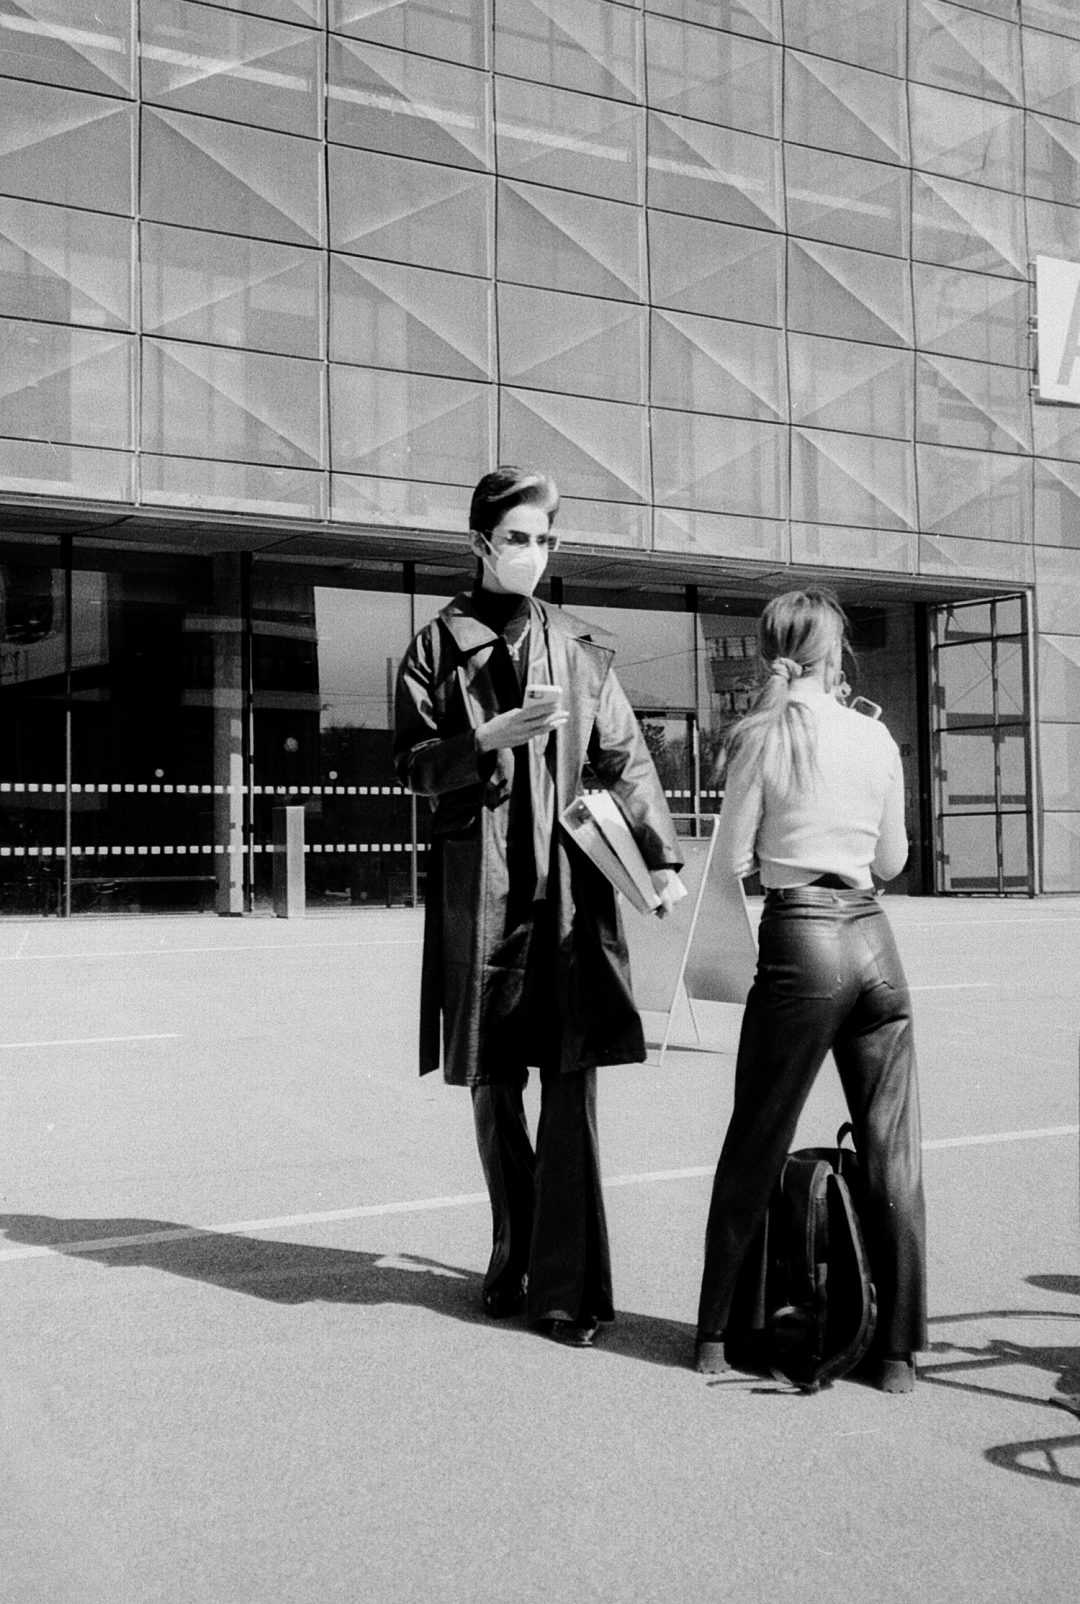 #111 Leather, Leather, Graz